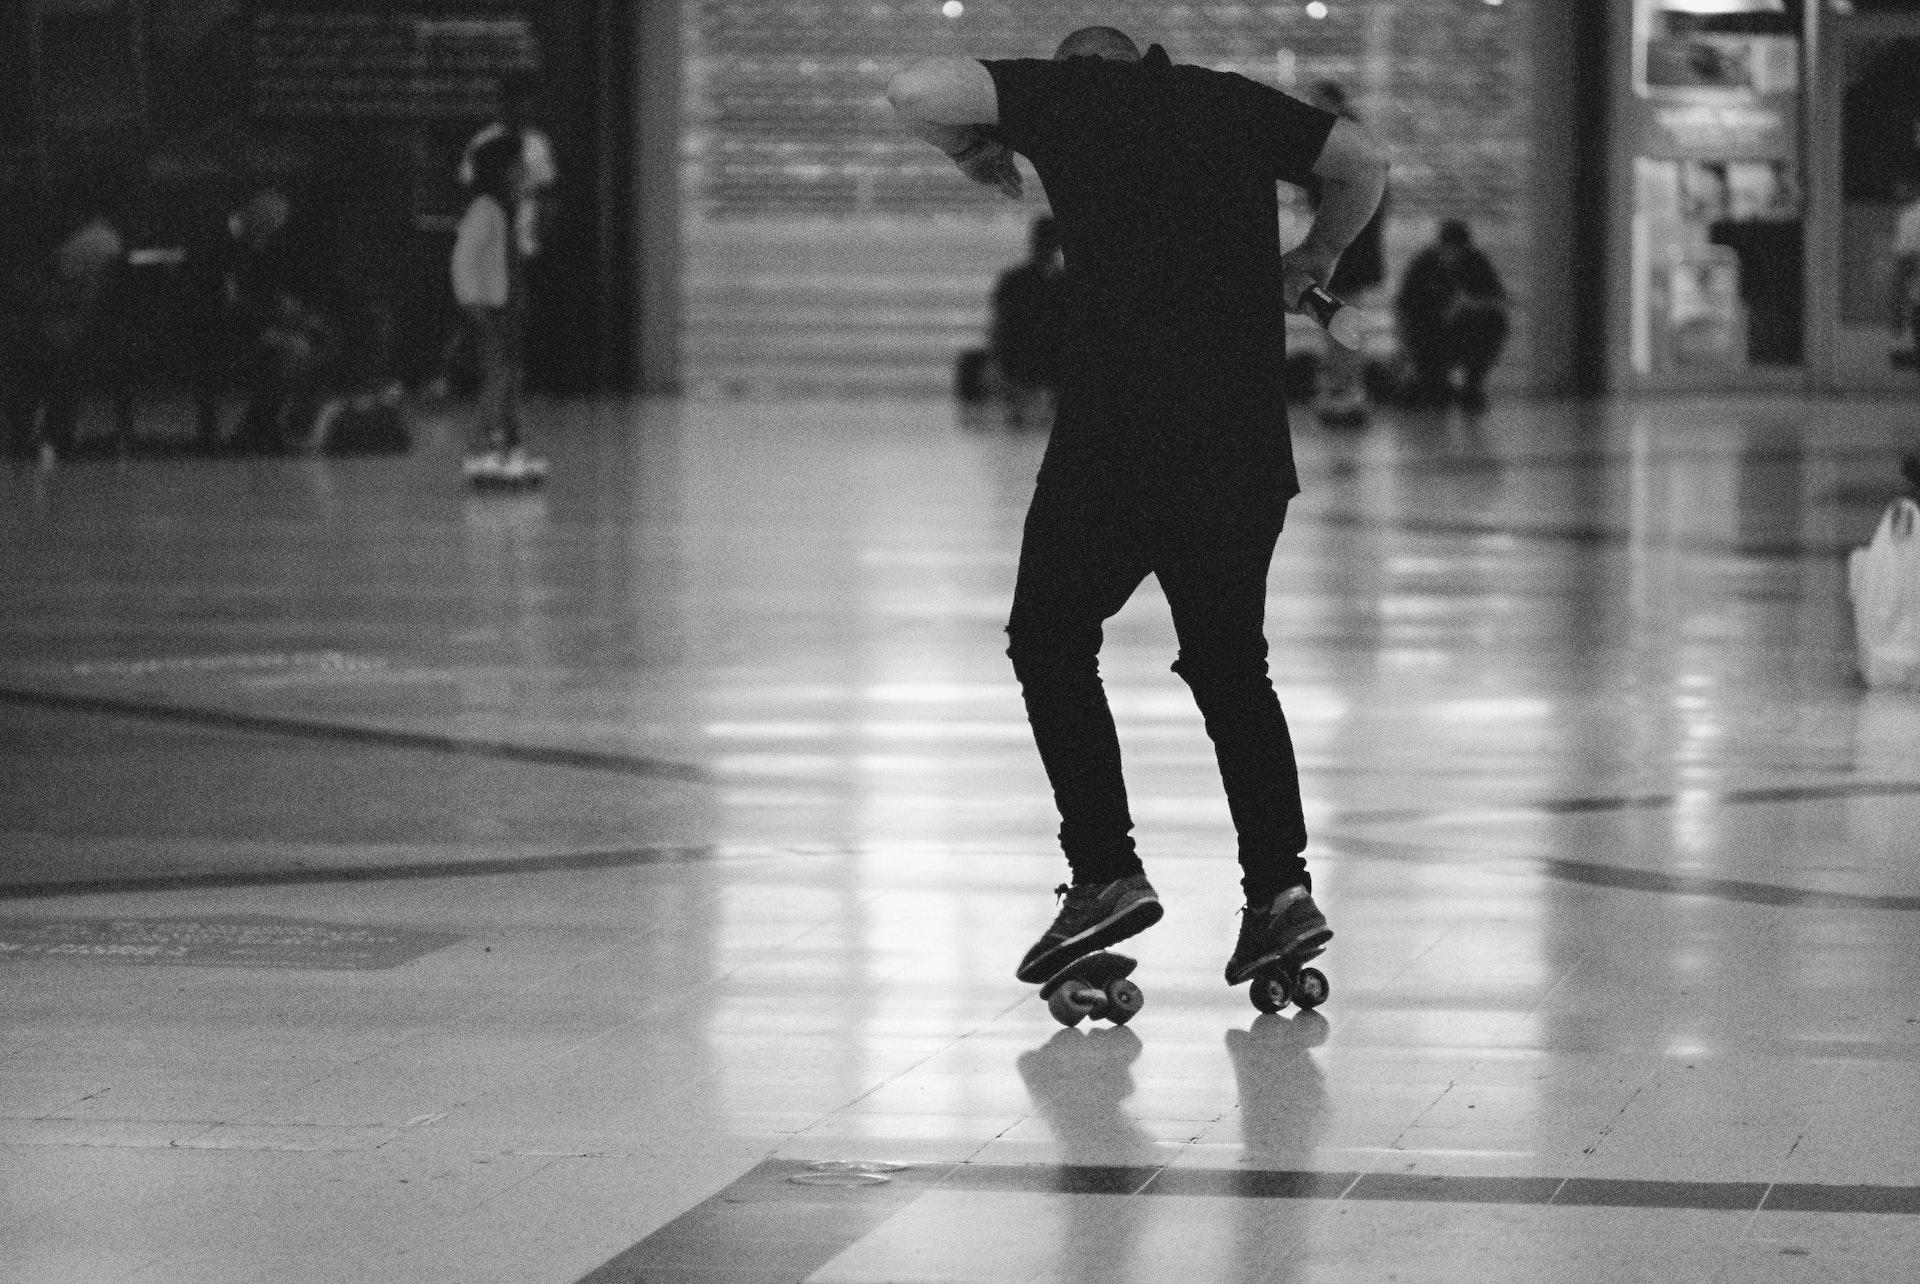 Stratford_Centre_Skaters_Lighter-39